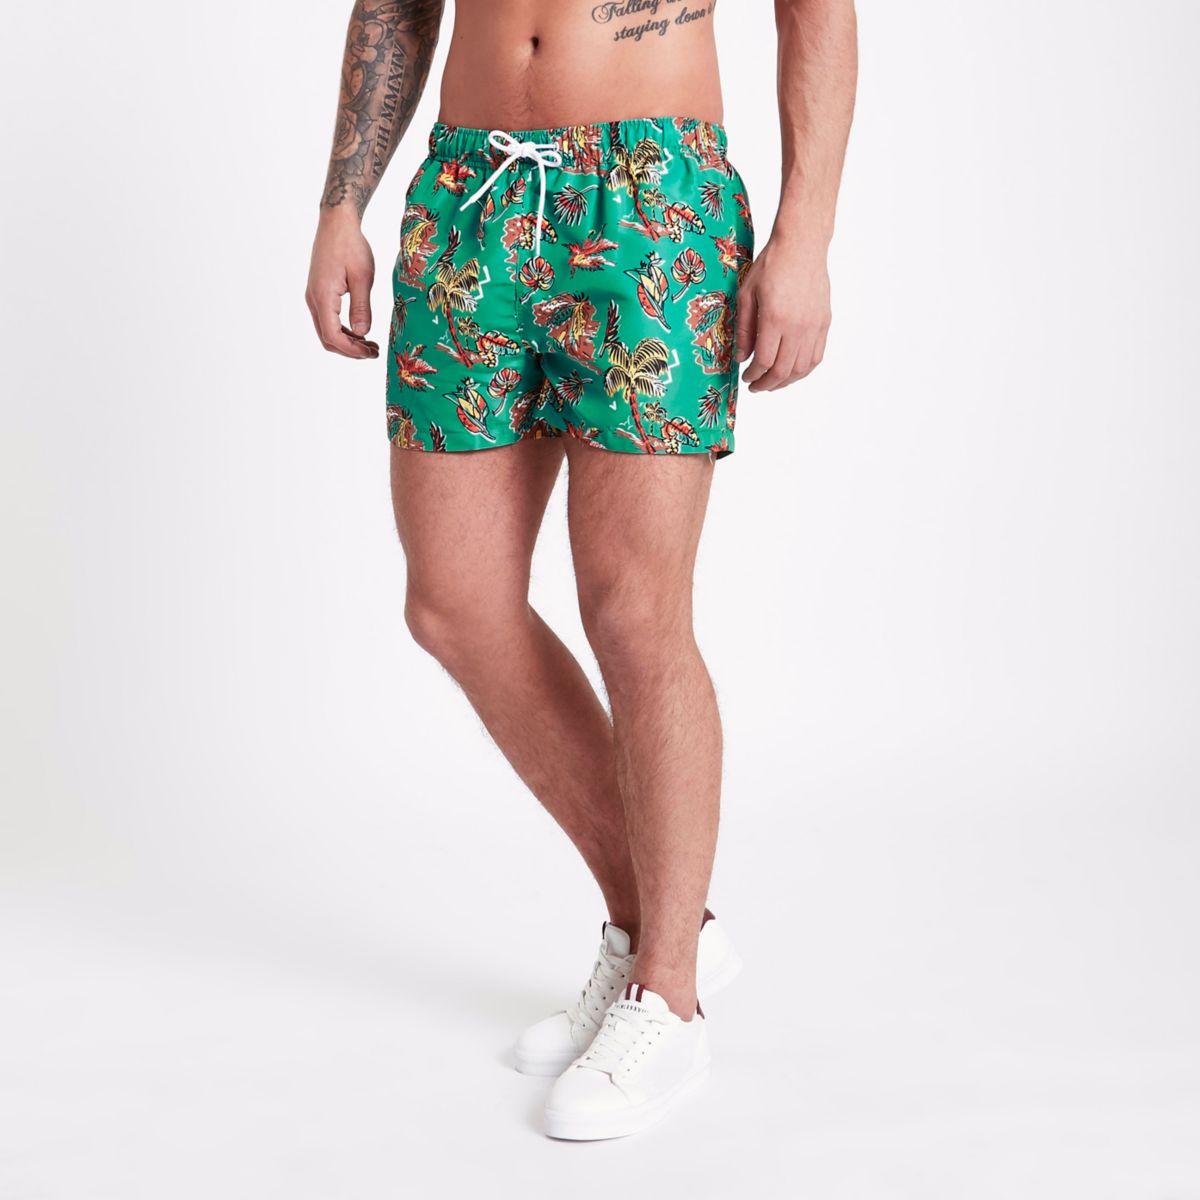 Green palm Hawaii print short swim trunks